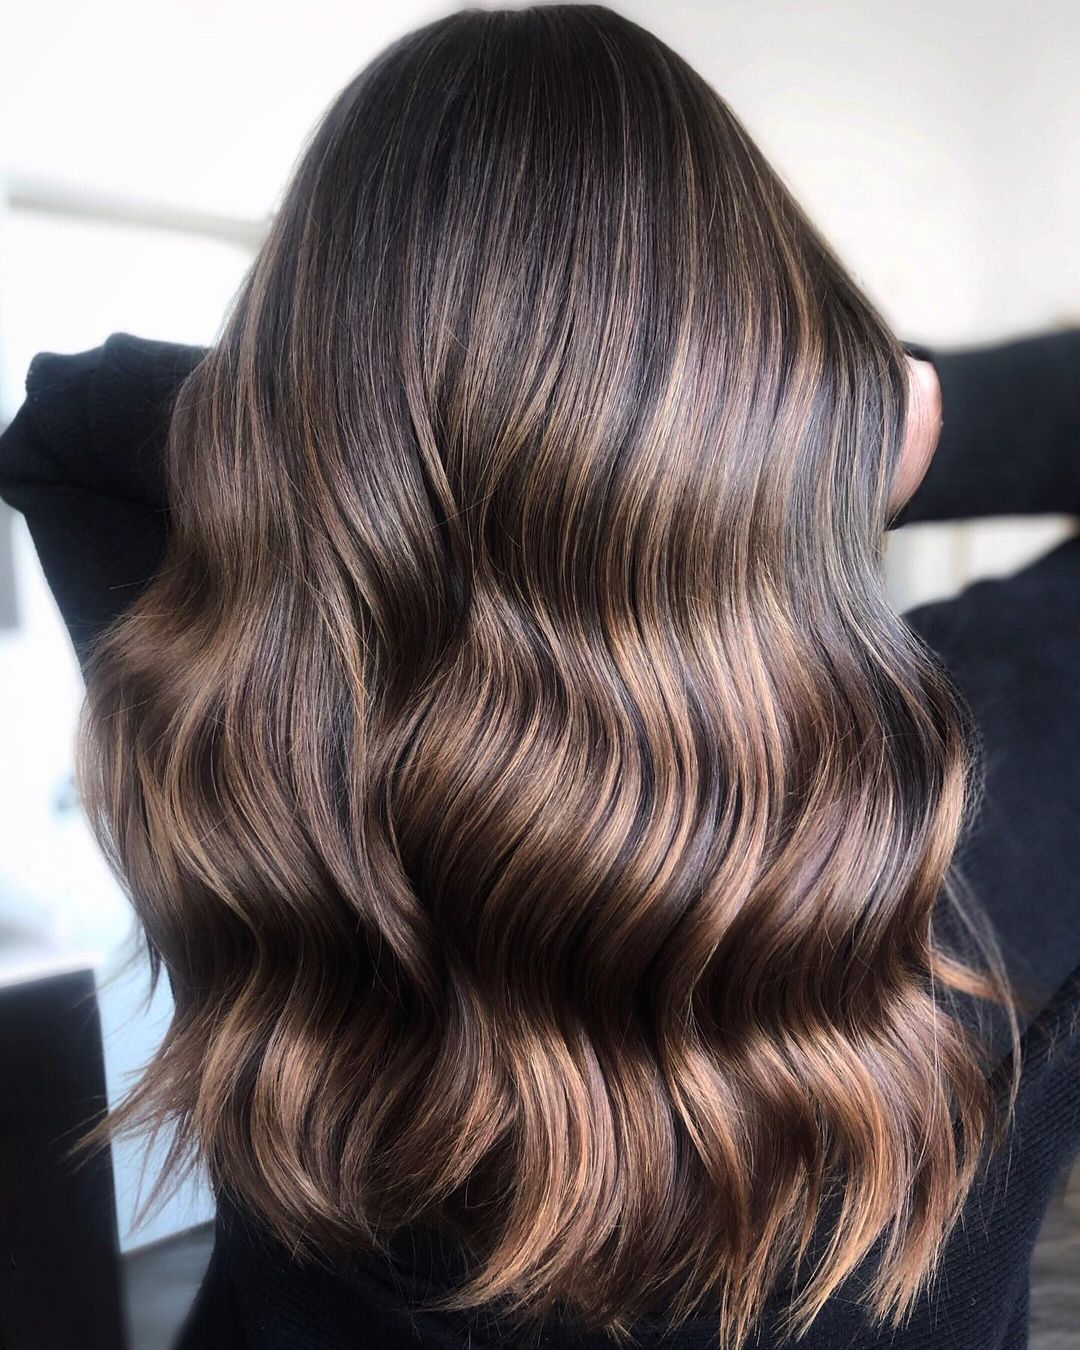 Golden Babylights for Dark Brown Hair